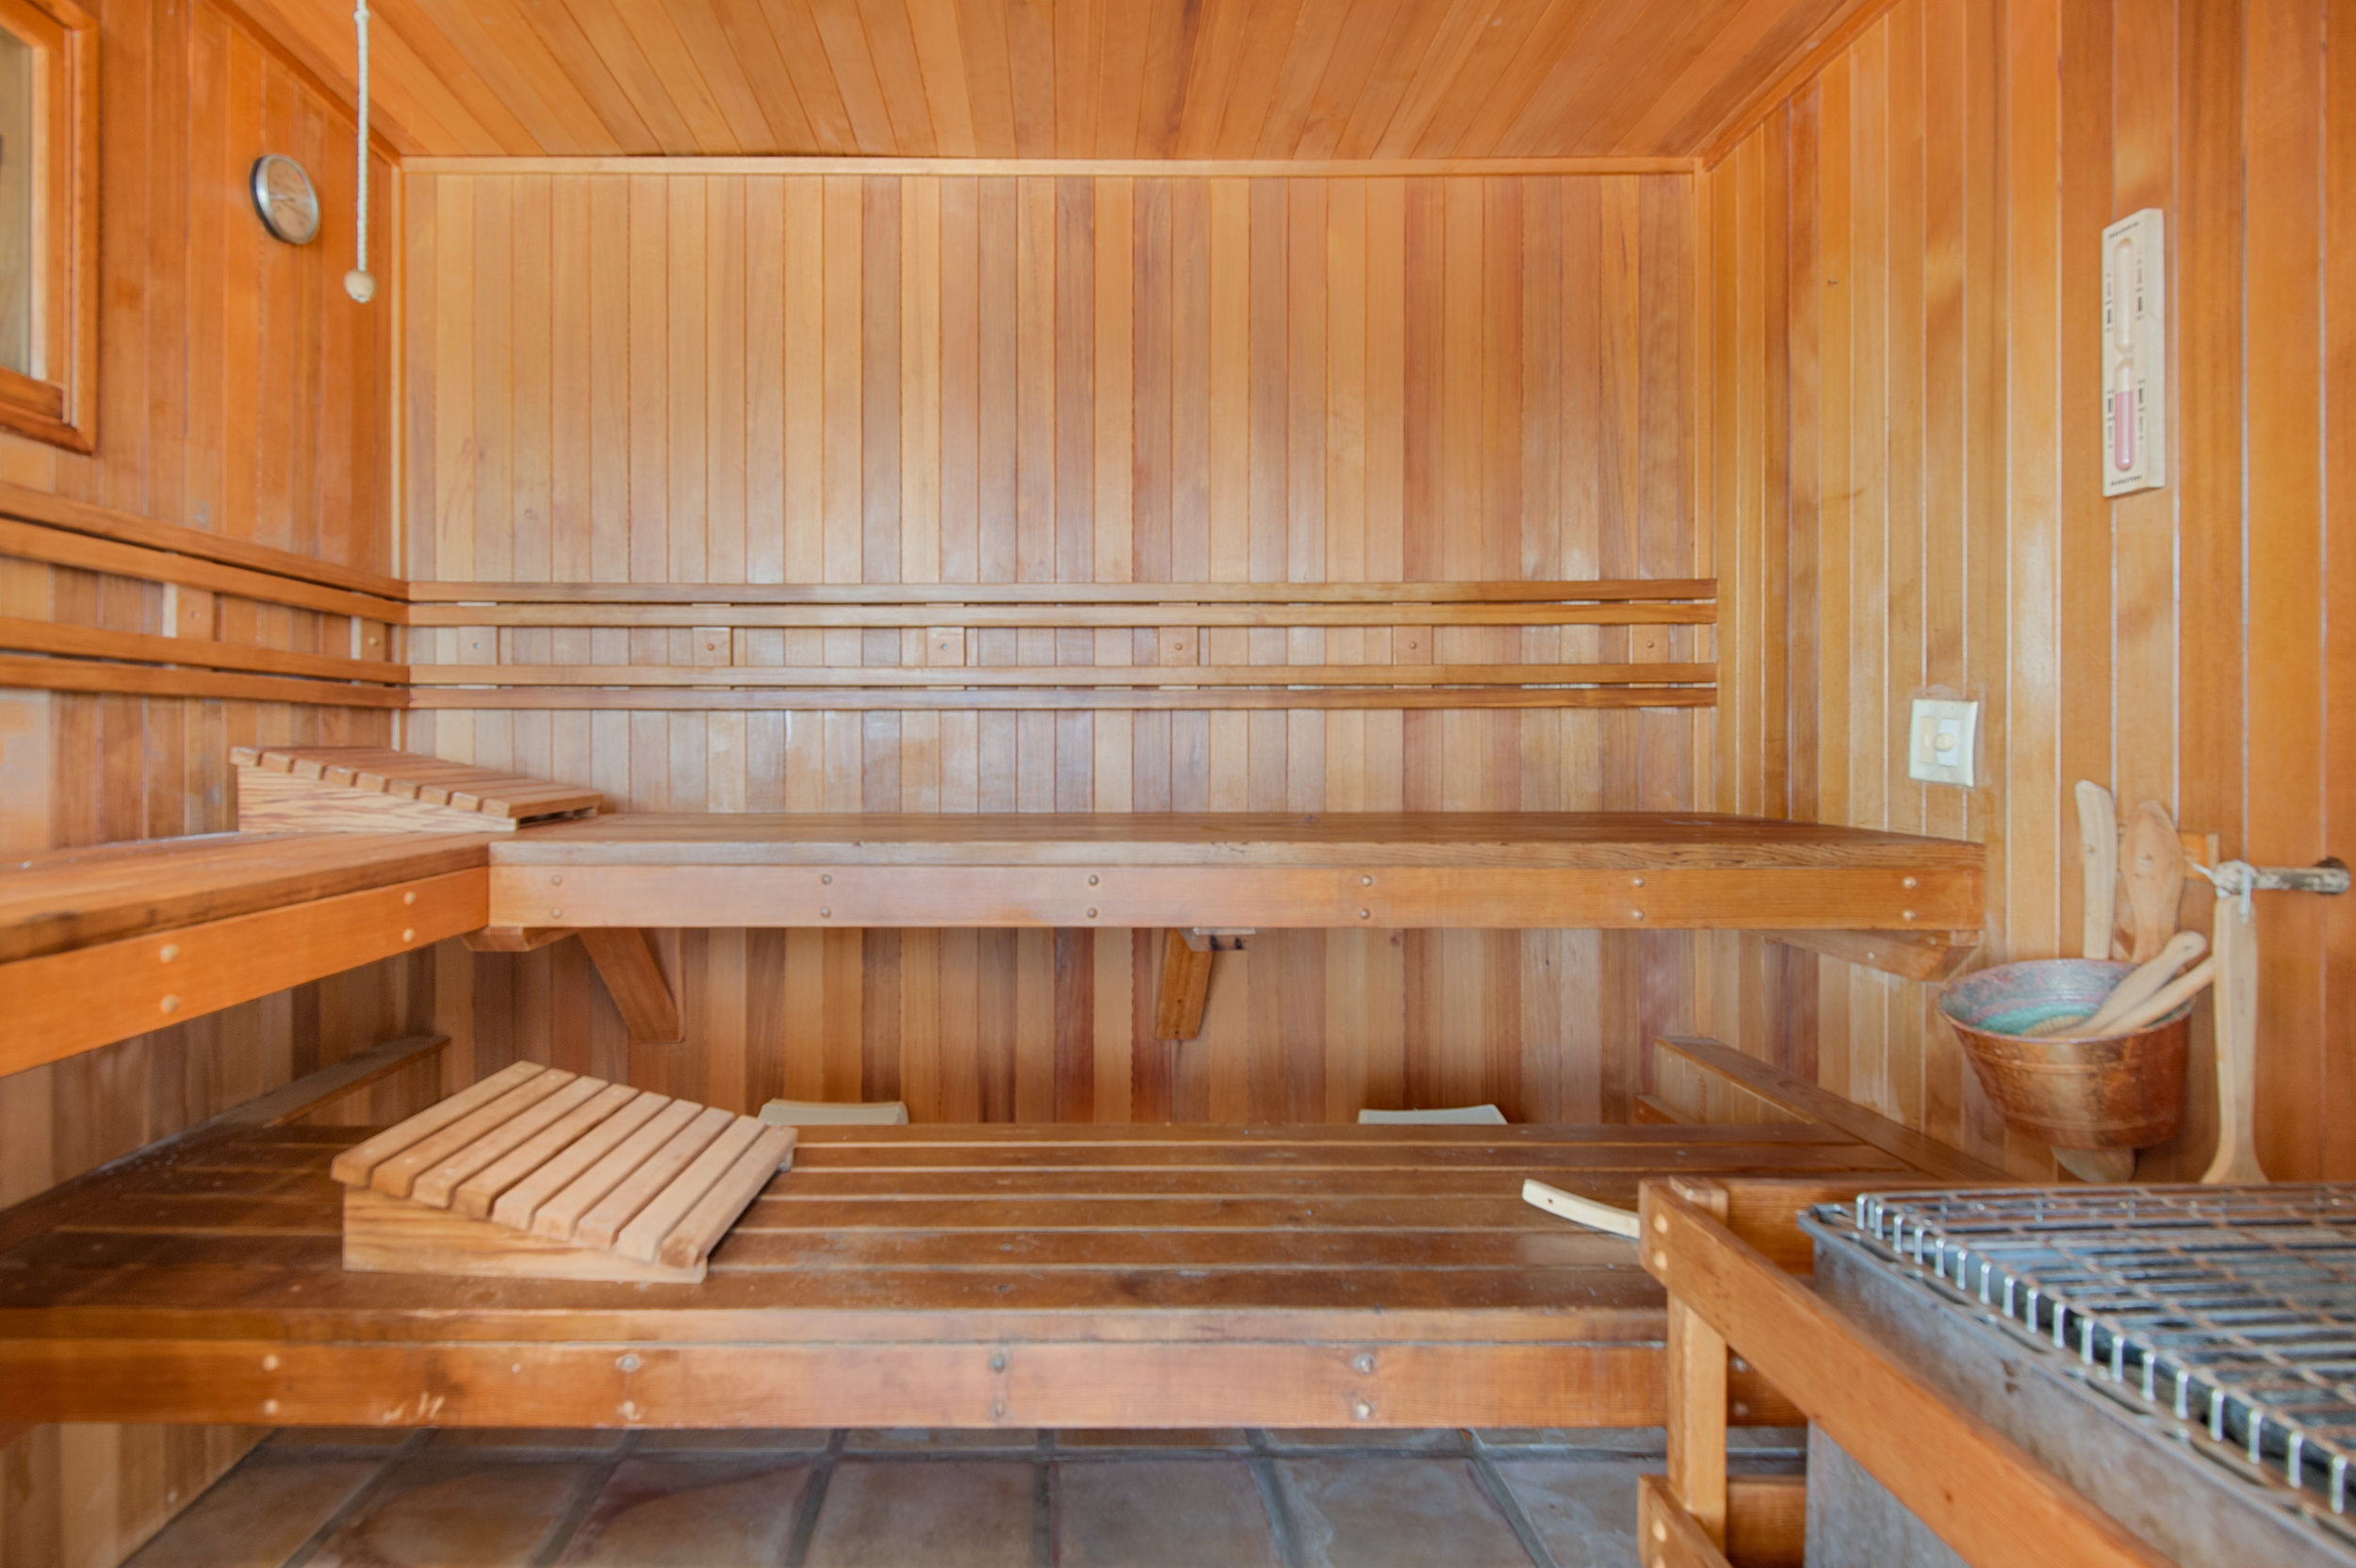 026 Sauna 25342 Malibu Road For Sale Lease The Malibu Life Team Luxury Real Estate.jpg